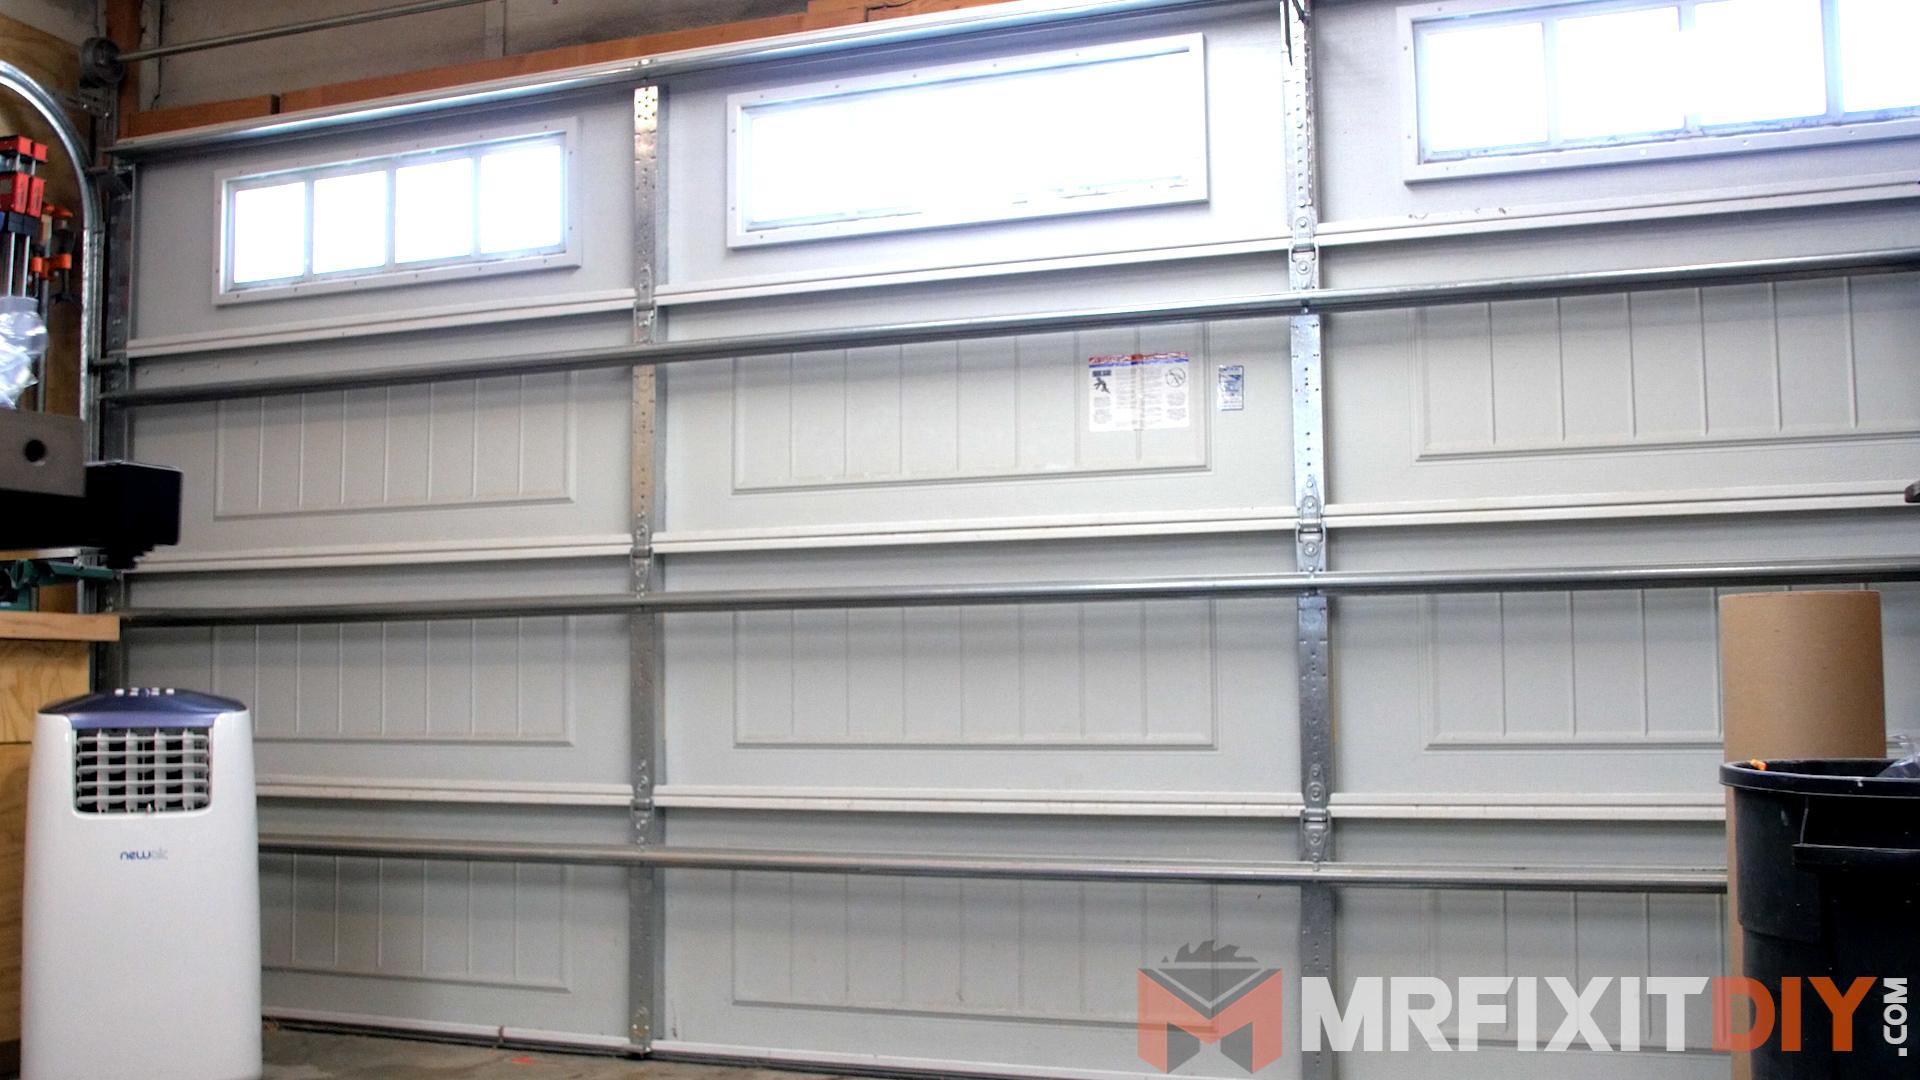 Picture of Preparing to Insulate the Garage Door